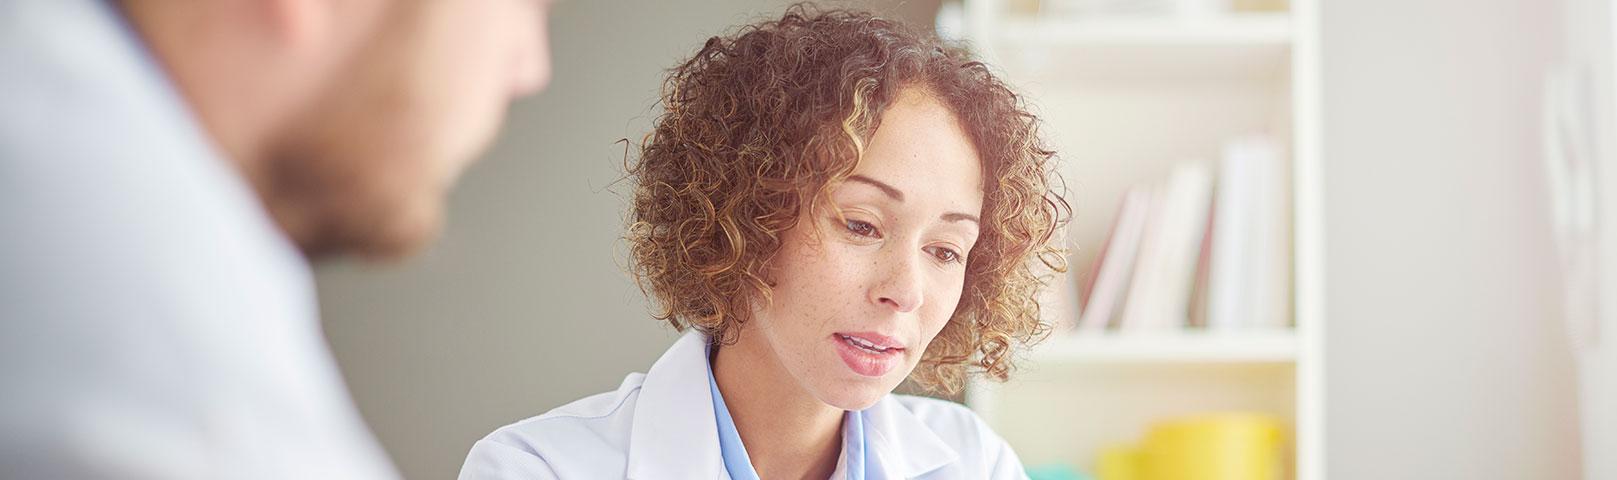 Audiologist talking to a patient about Meniere's Disease